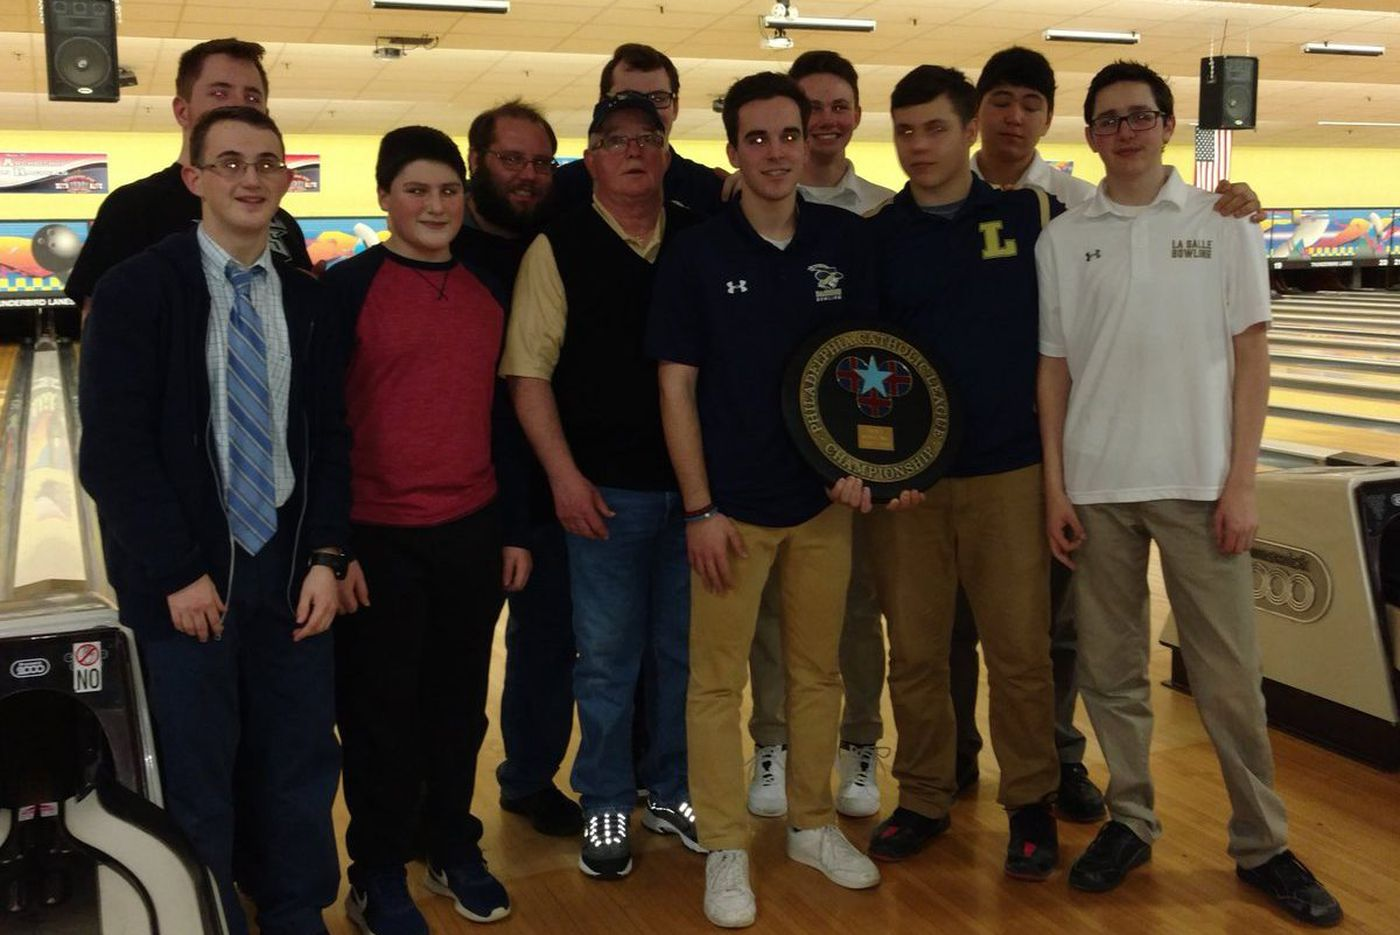 La Salle rolls to Catholic League boys' bowling title